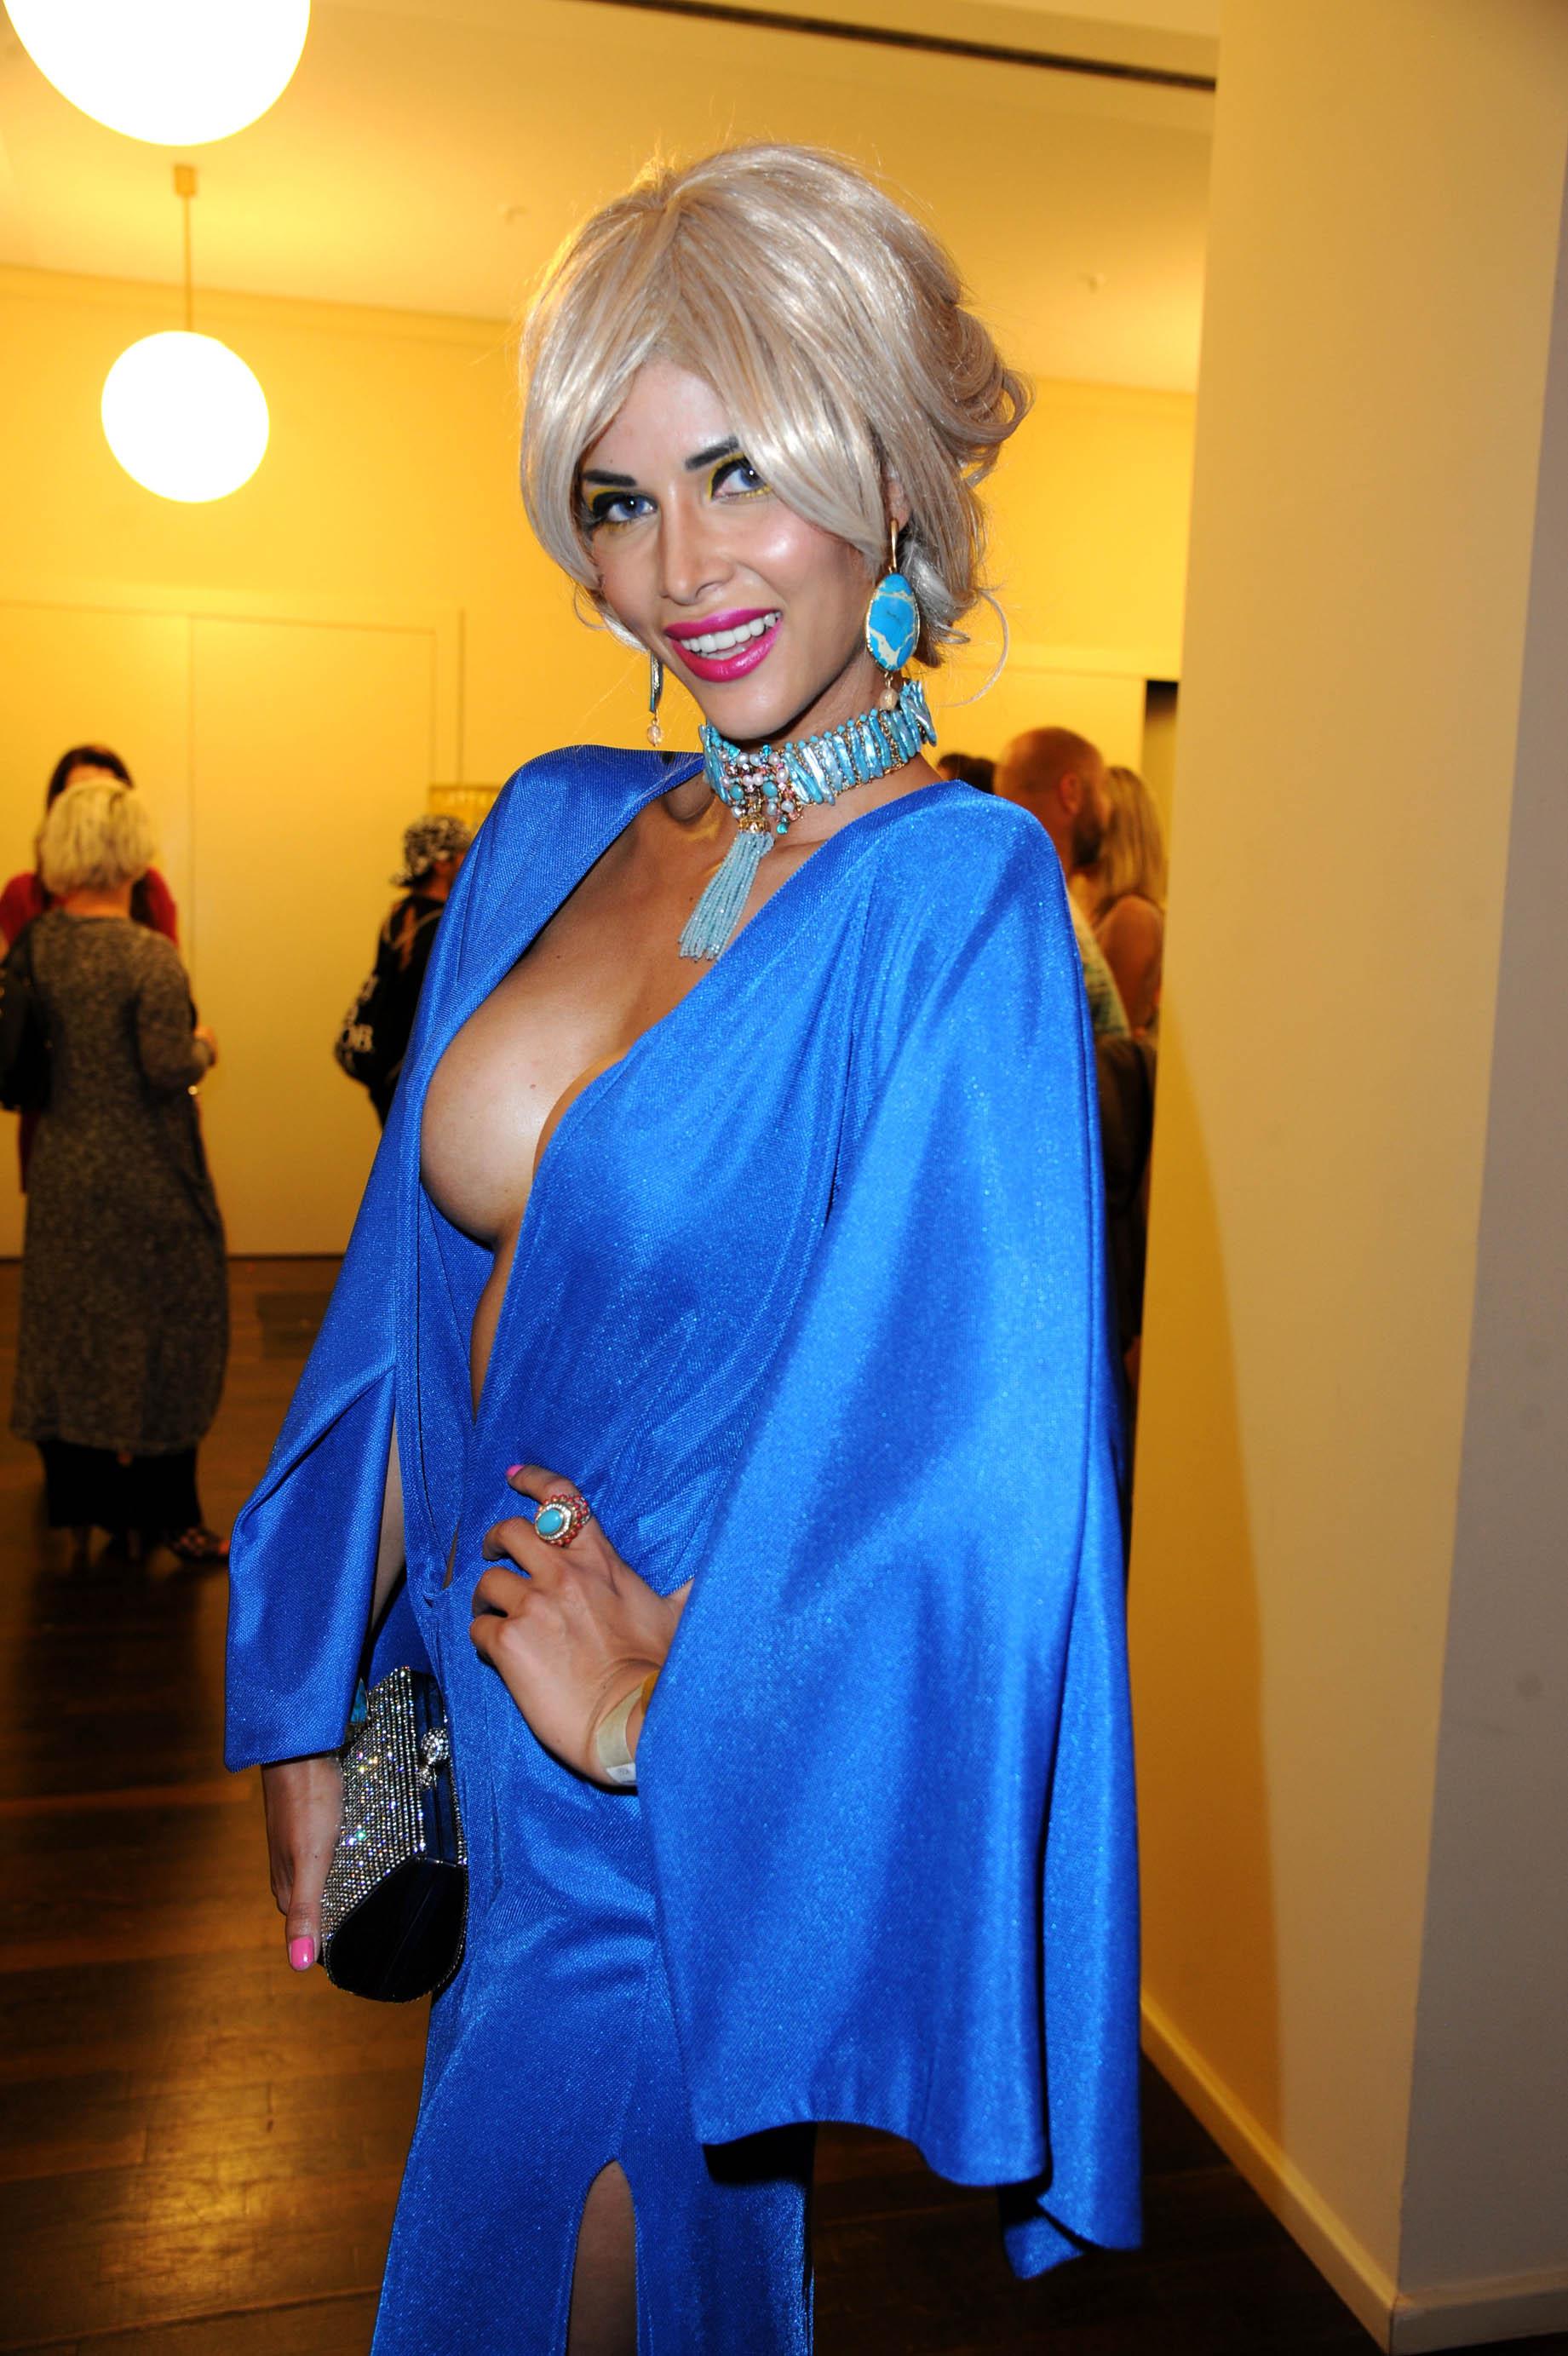 Micaela Schaefer 2014 Fashion Week 02 Gotceleb